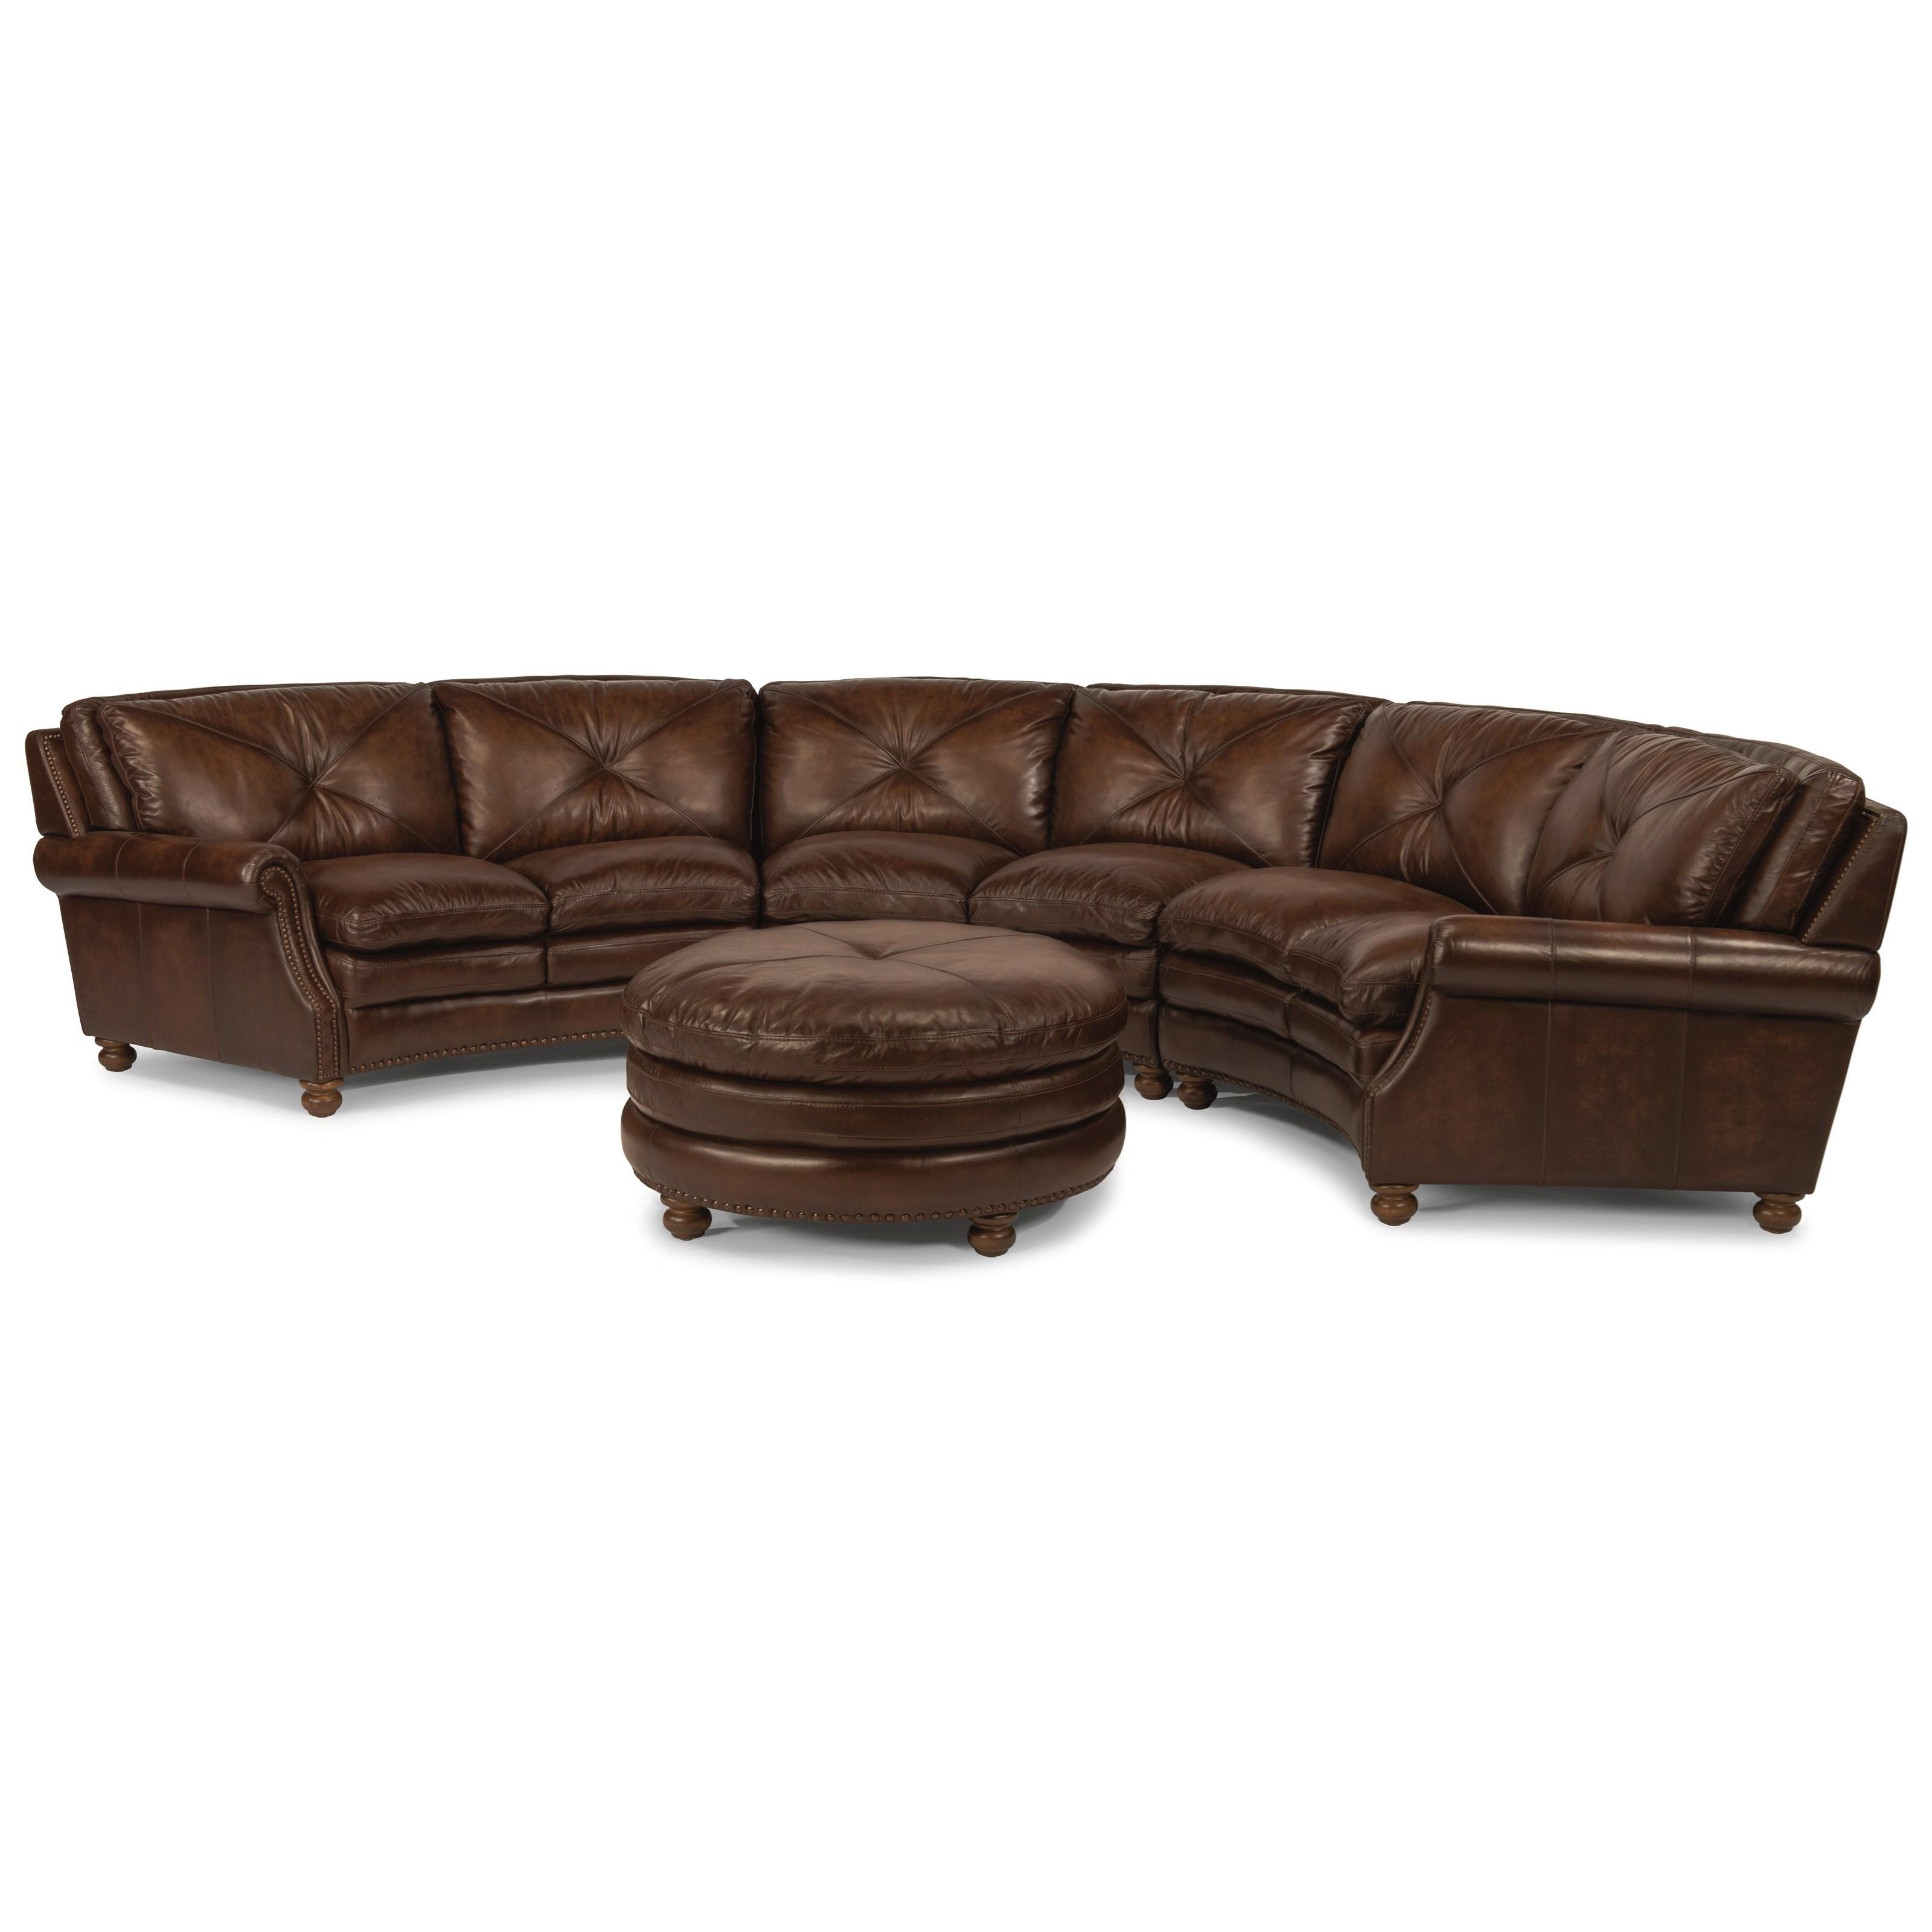 Flexsteel Latitudes Suffolk Round Sectional Sofa With Nailhead Trim